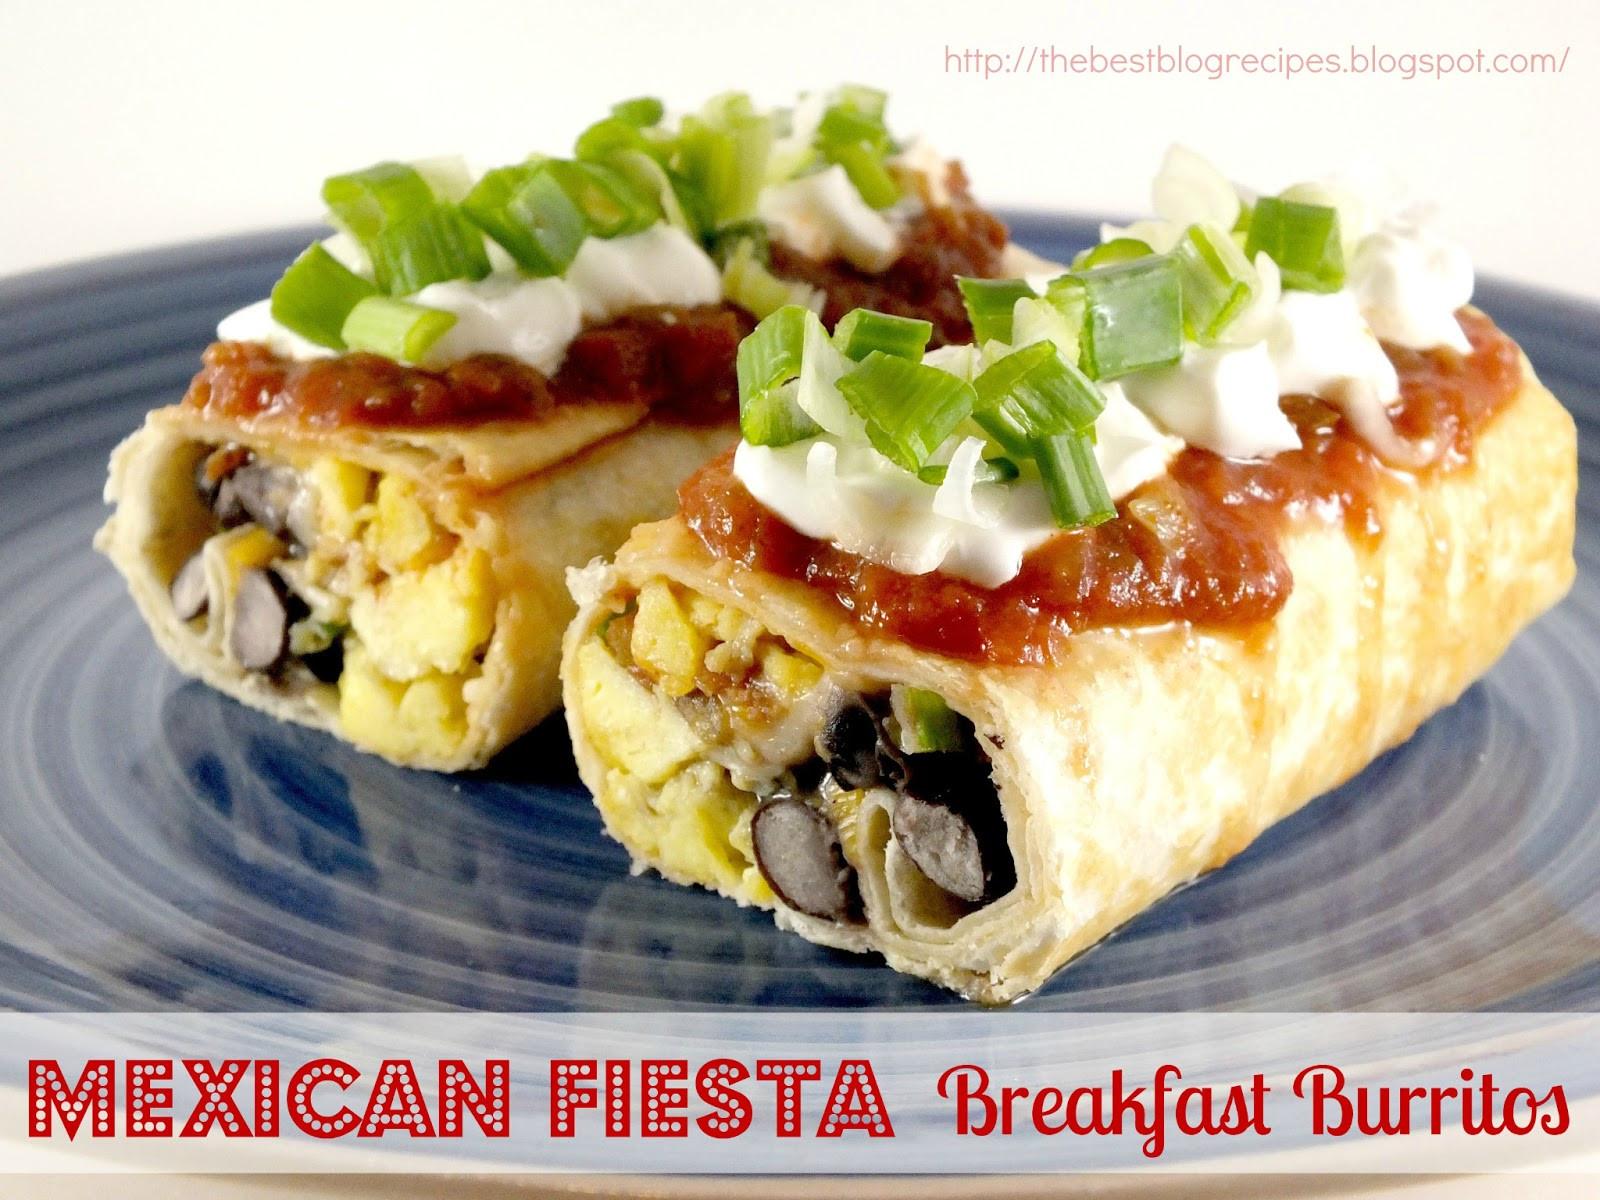 Mexican Breakfast Recipes  Mexican Fiesta Breakfast Burritos The Best Blog Recipes